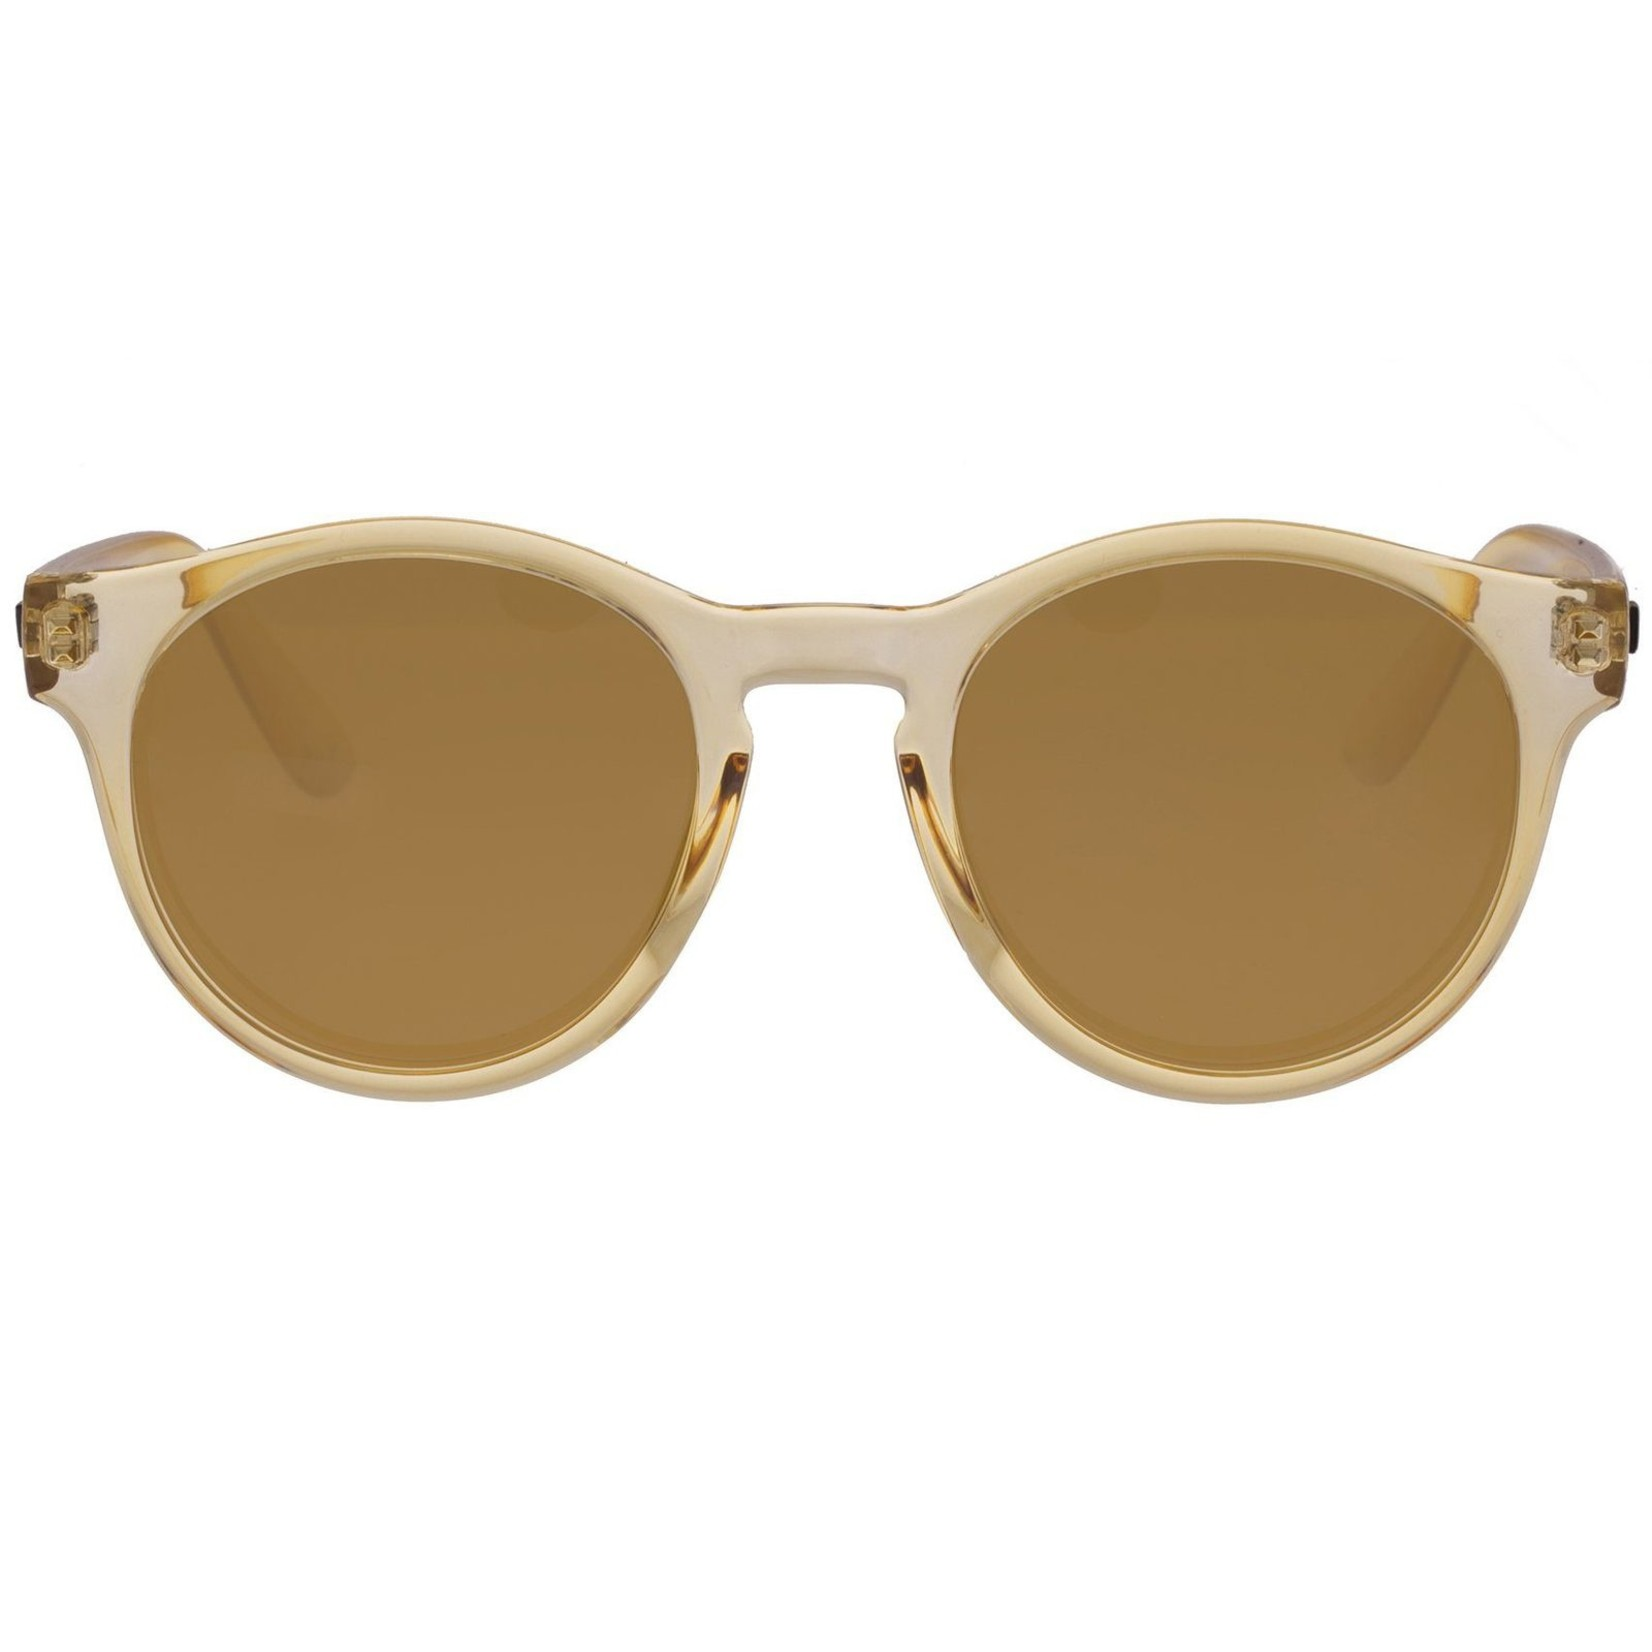 Le Specs Le Specs Hey Macarena Sunglasses